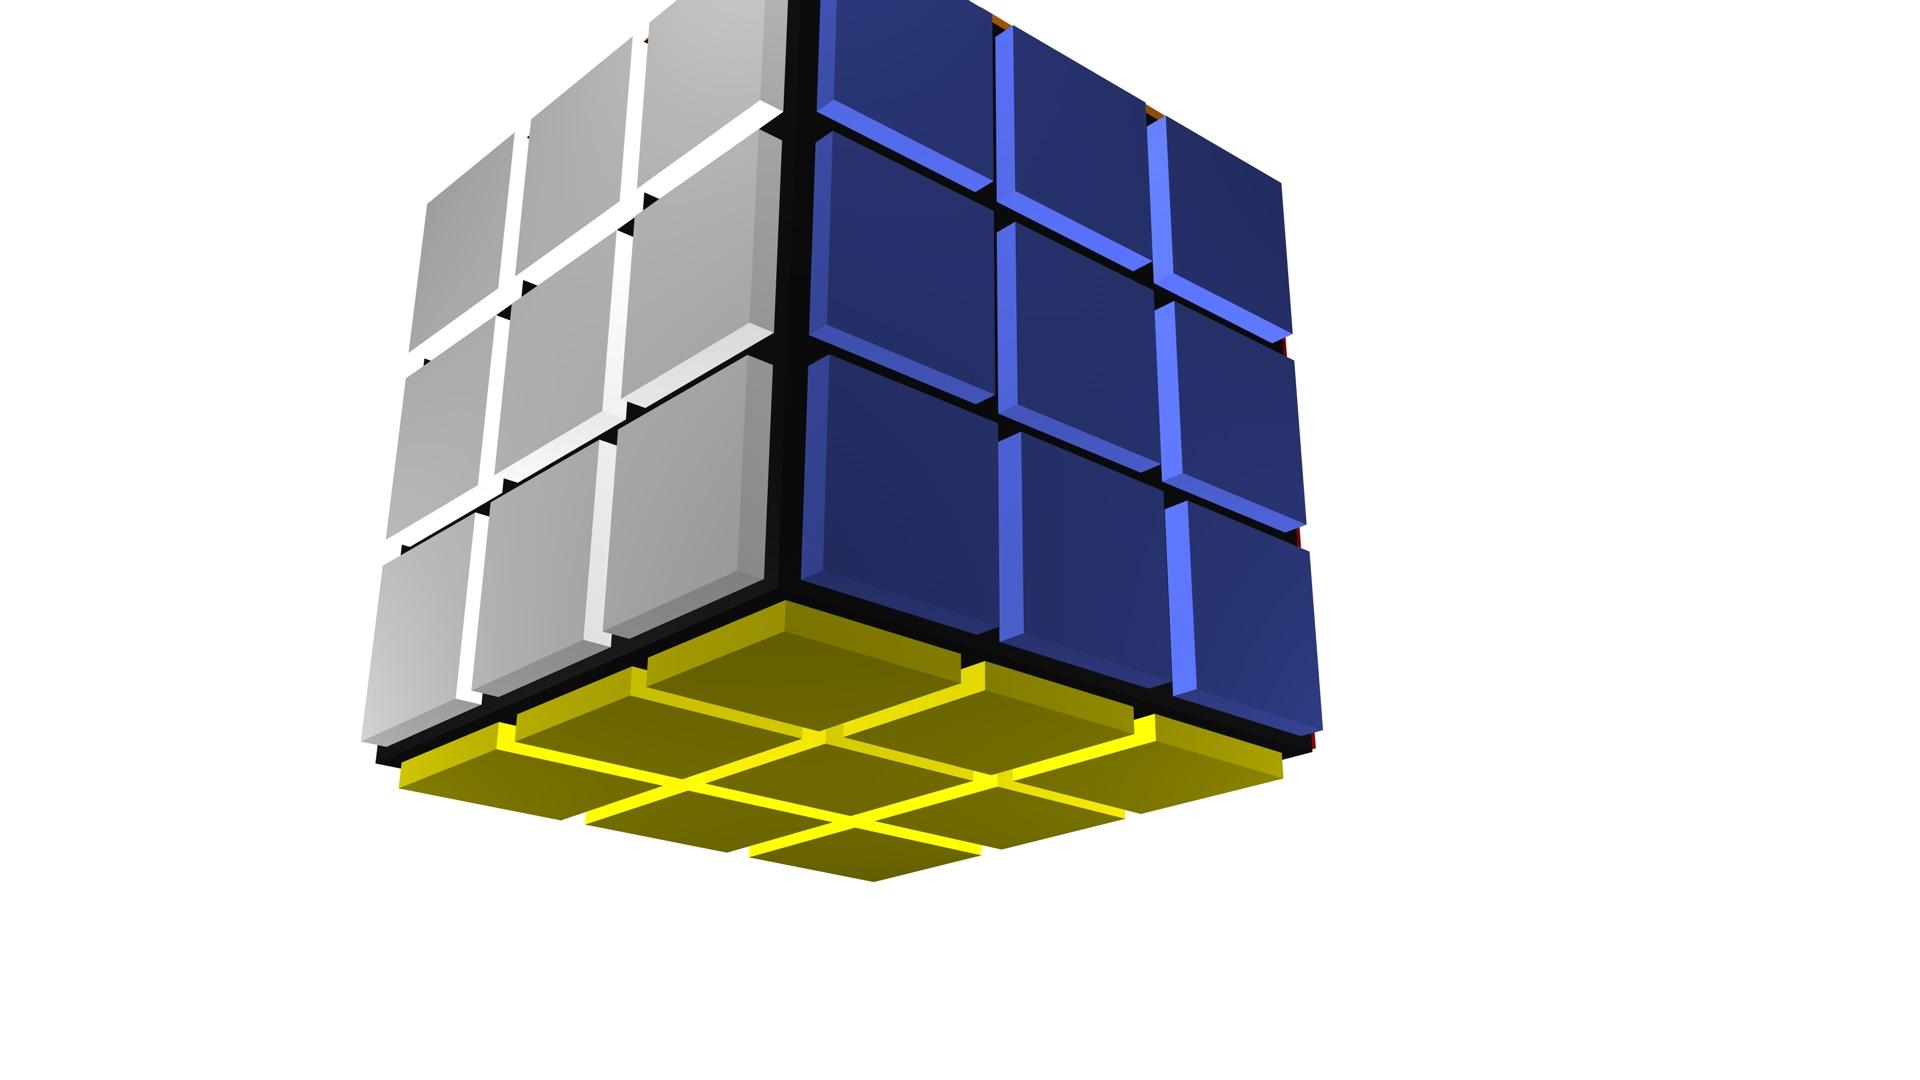 cheat code rubix cube solution software